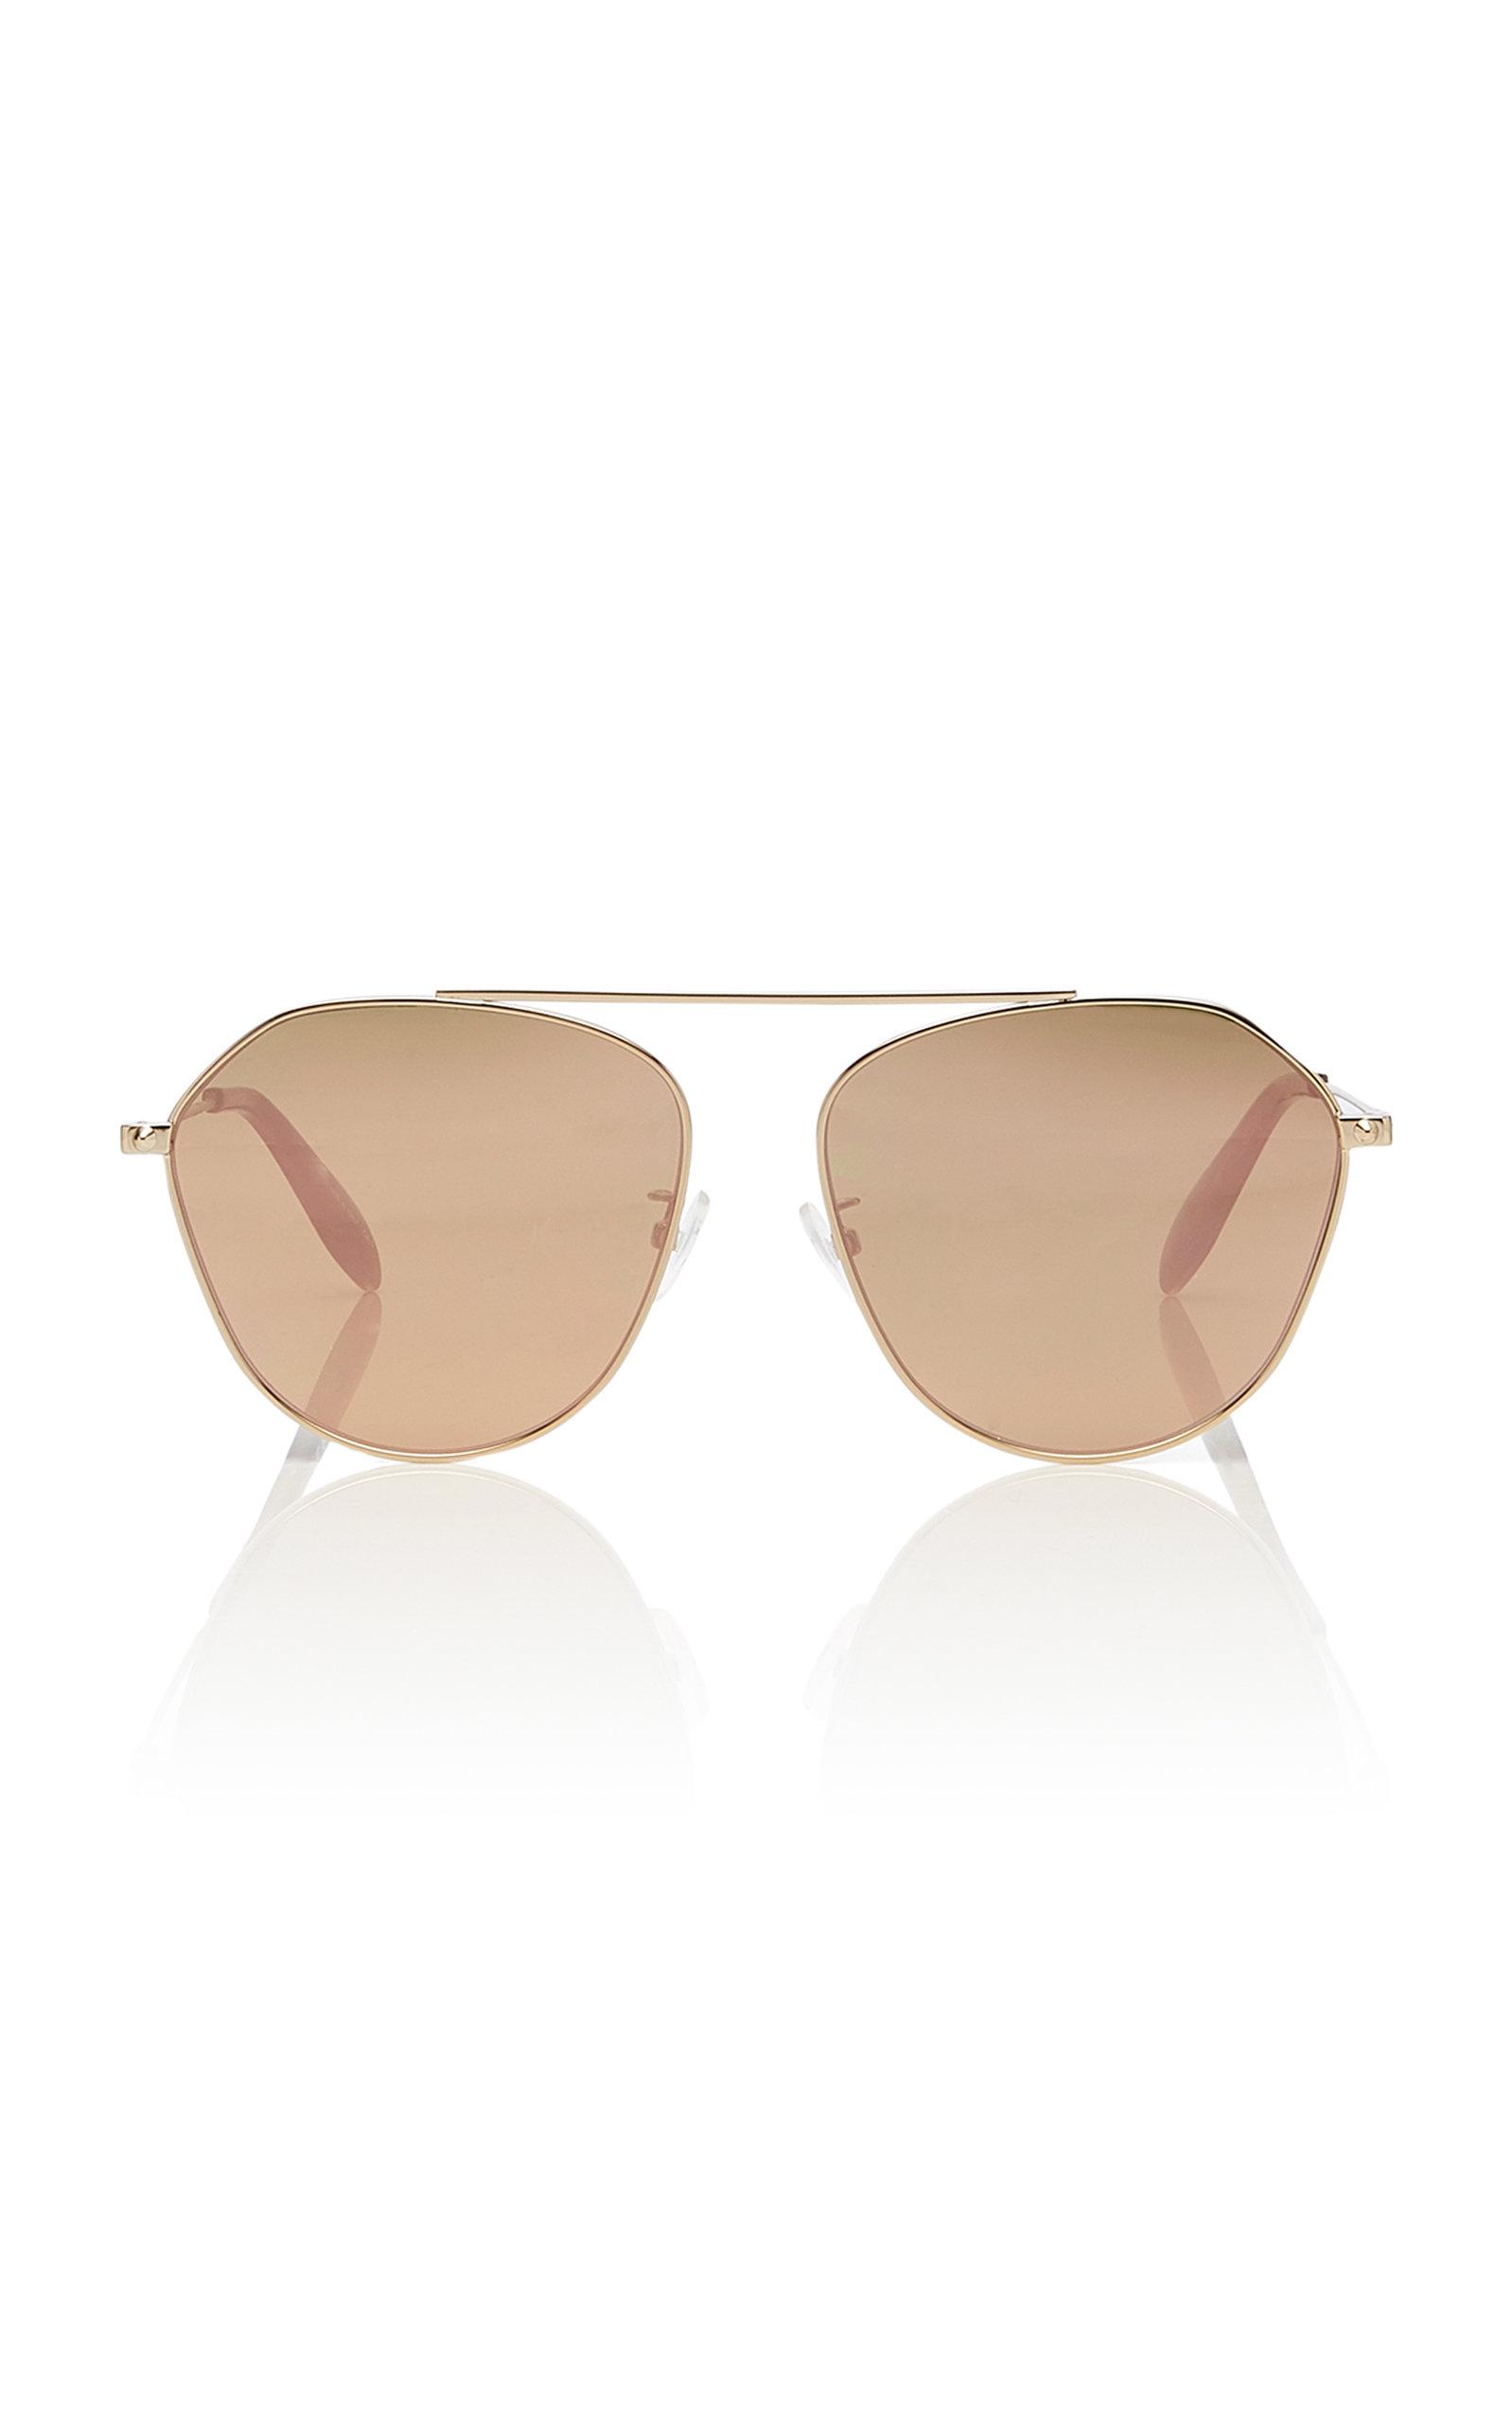 ALEXANDER MCQUEEN | Alexander McQueen Sunglasses Gold-Tone Mirrored Aviator-Style Sunglasses | Goxip